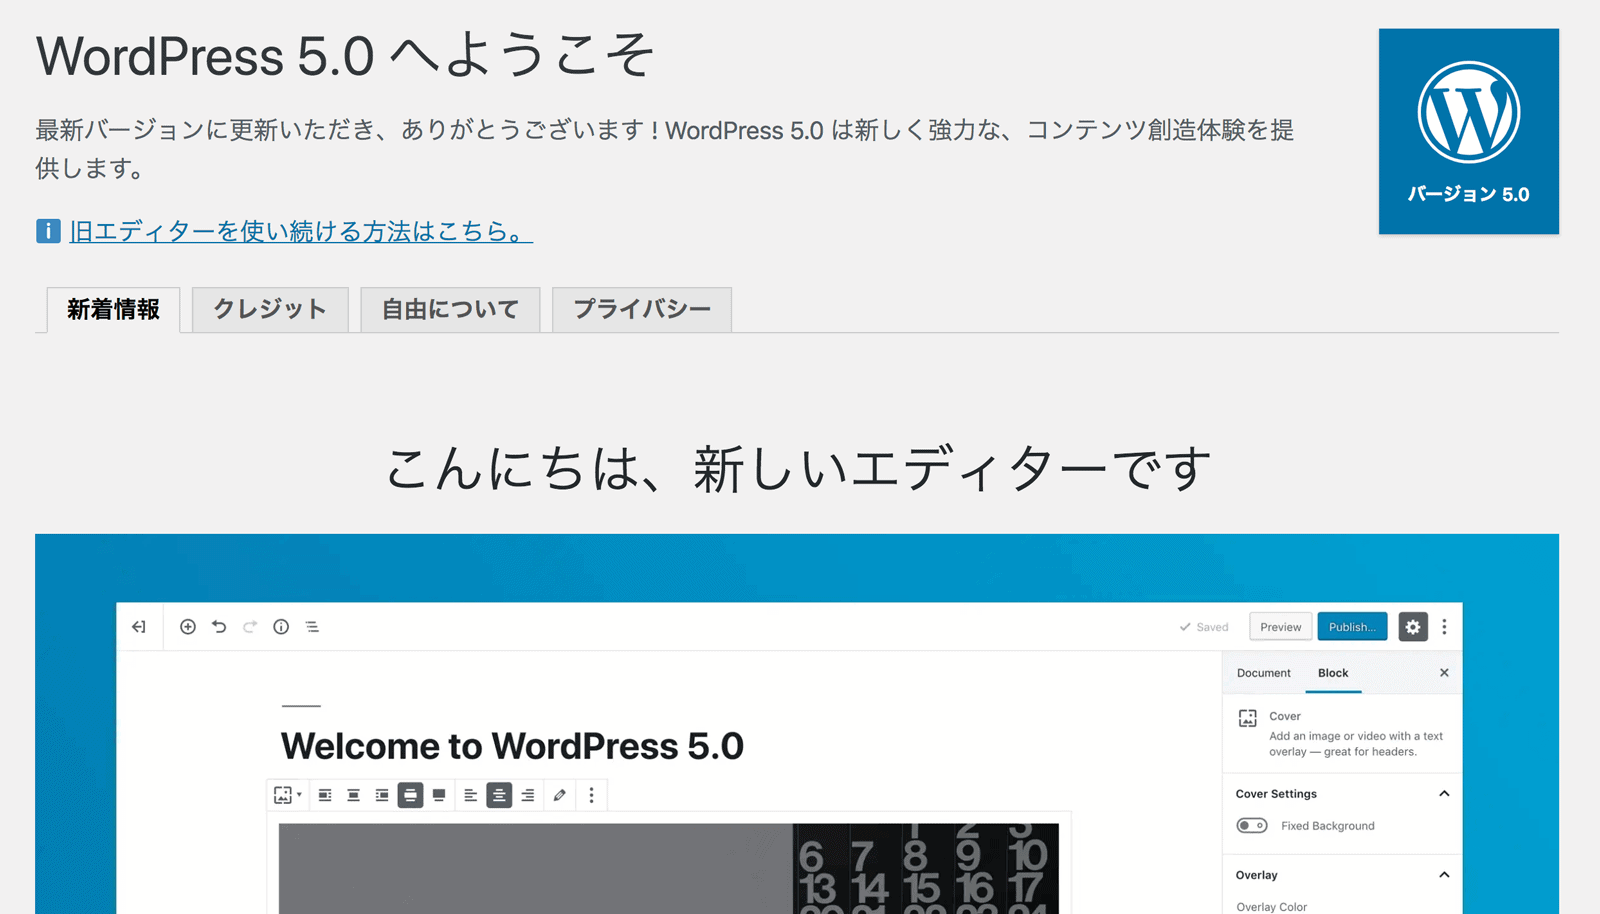 yStandardのWordPress 5.0 対応状況について